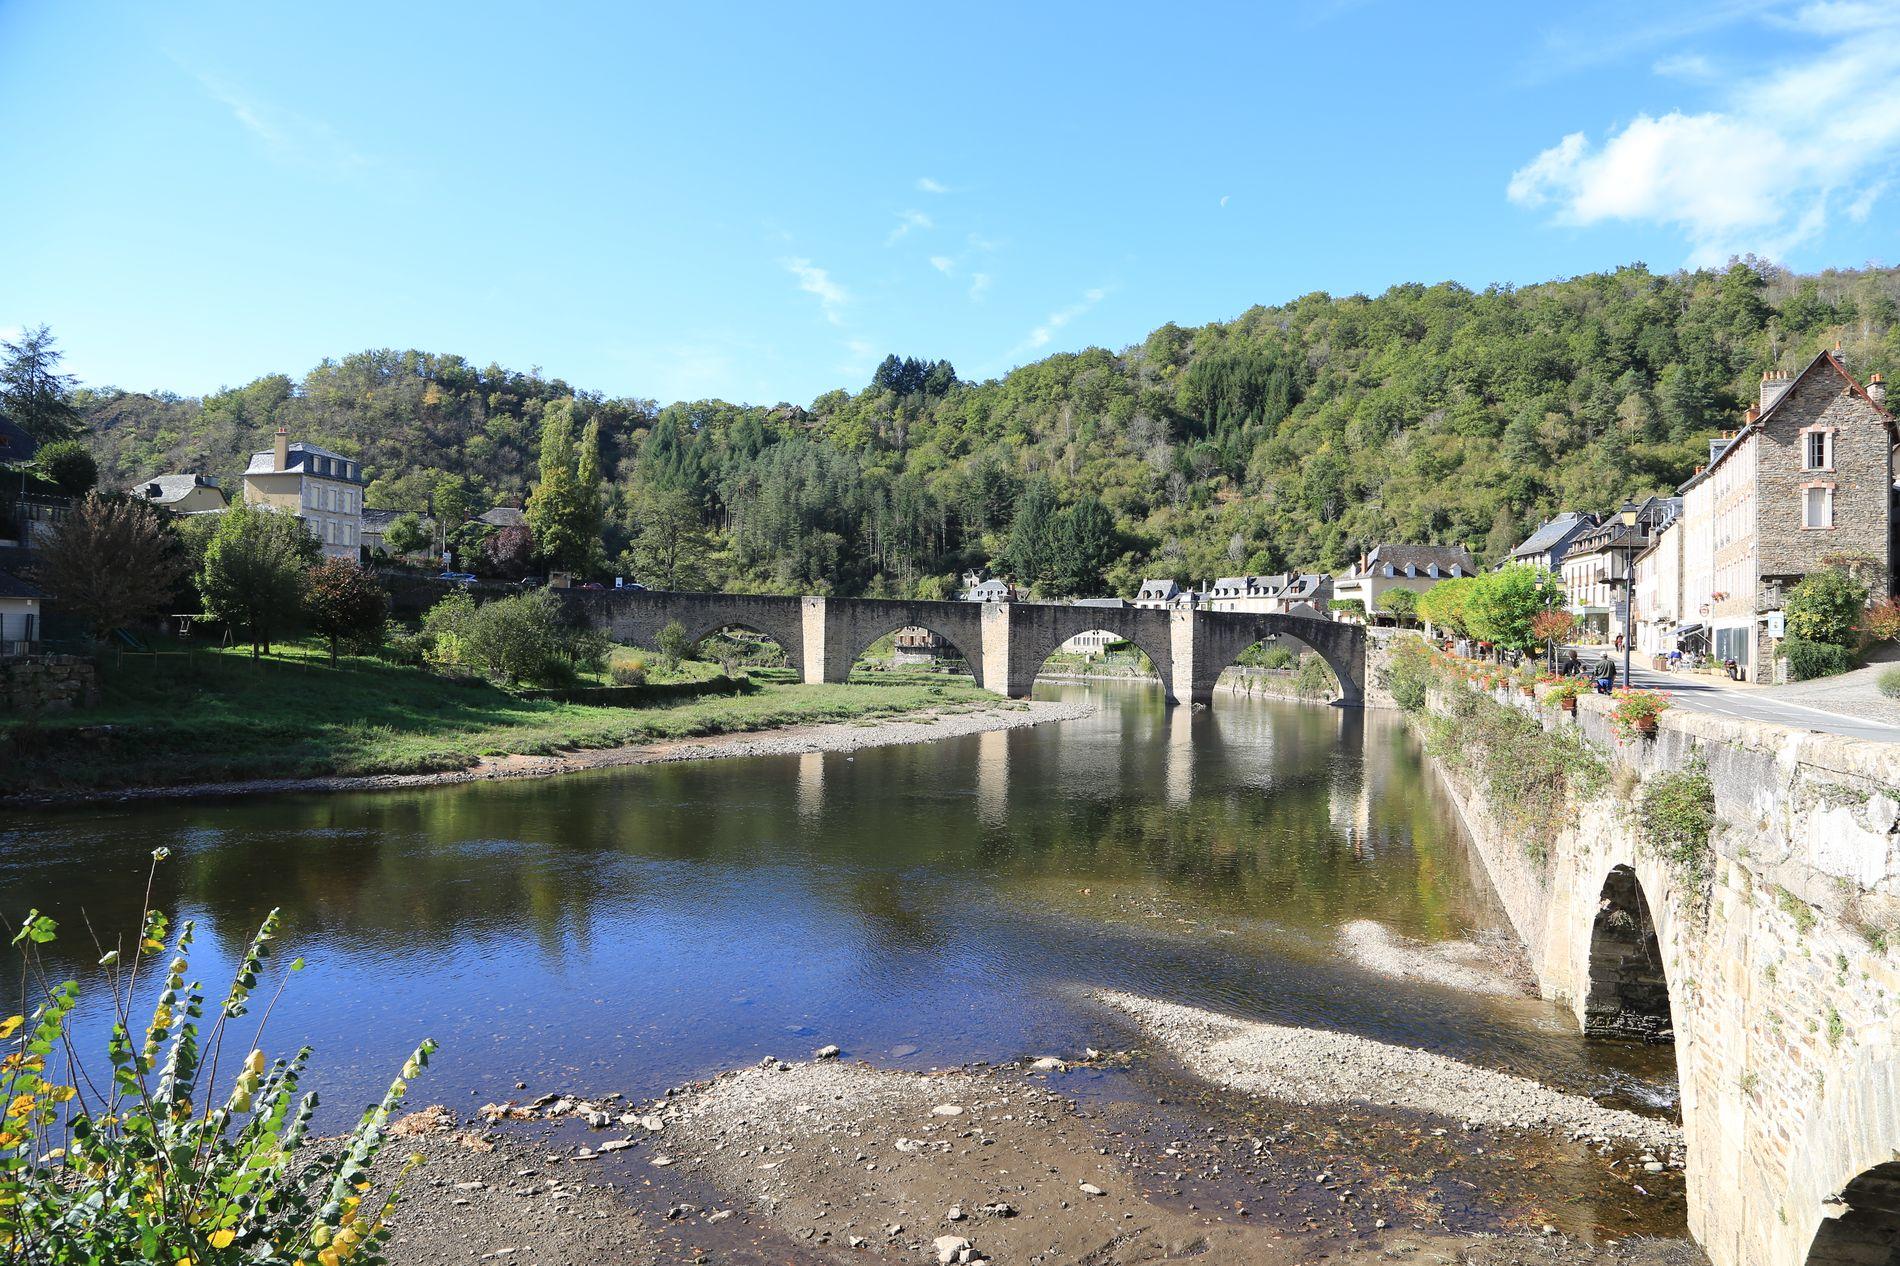 Balade moto dans le Cantal le 27 octobre 2013 - medium